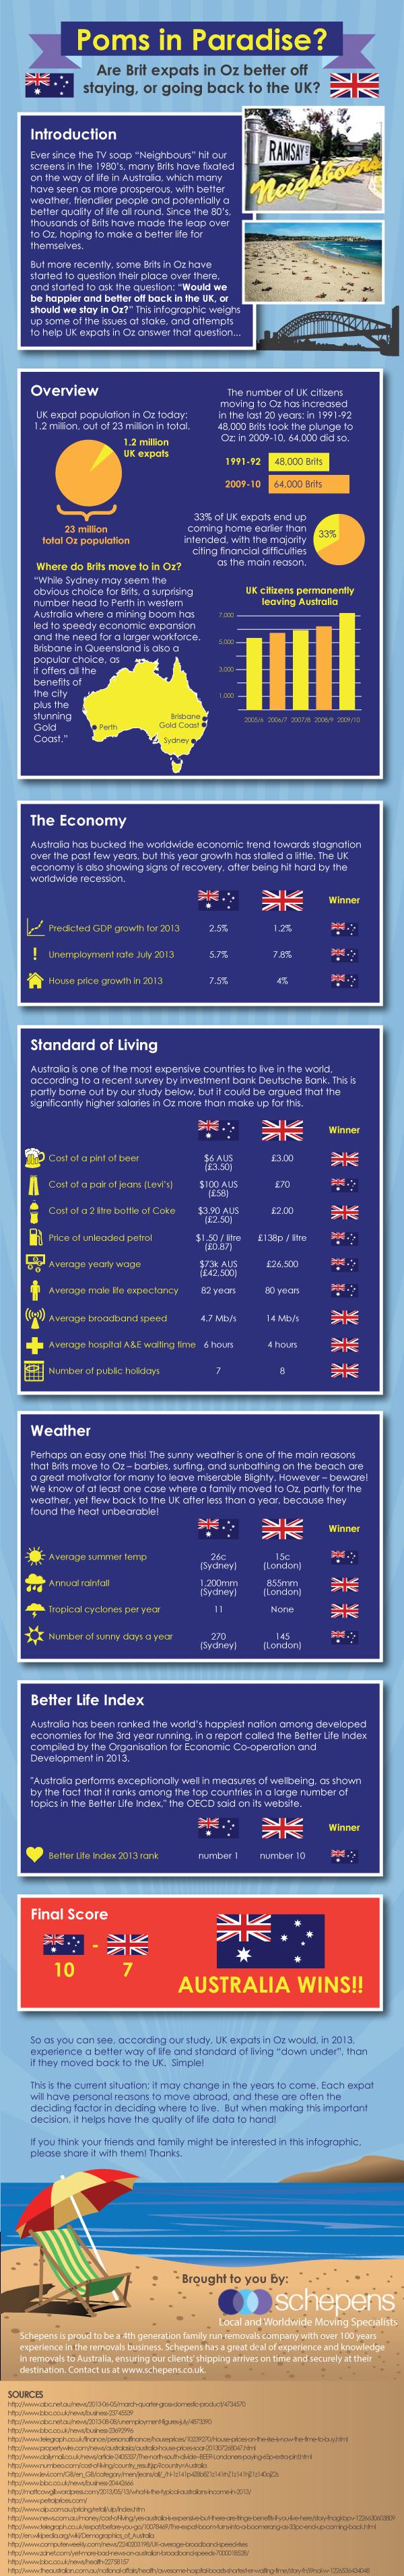 Britian vs australia